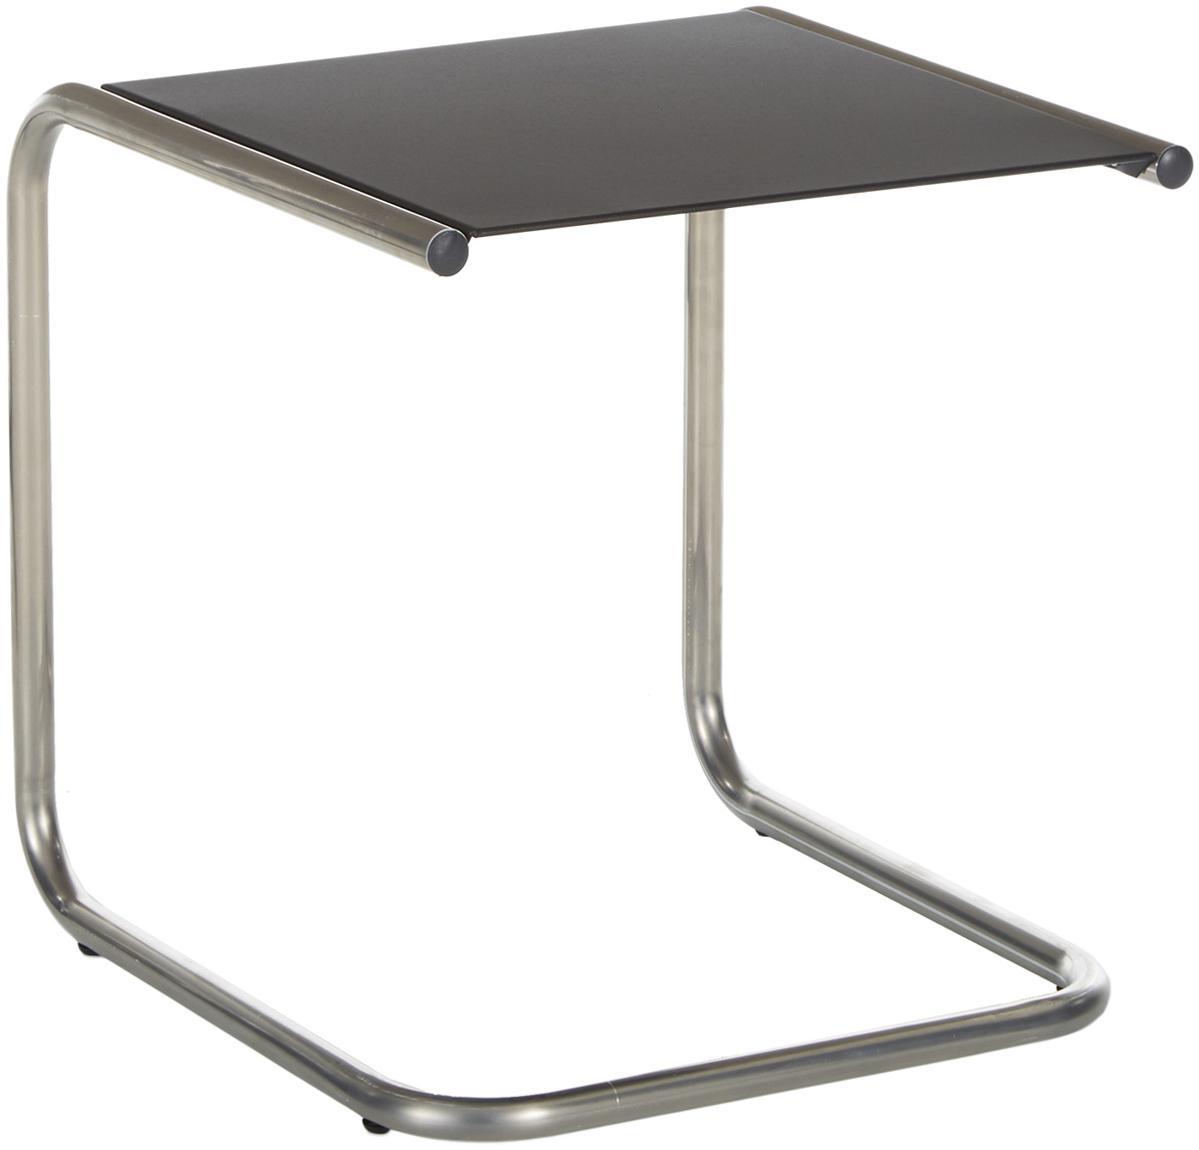 Mesa auxiliar de exterior de metal Club, Tablero: metal con pintura en polv, Estructura: aluminio pulido, Plateado, negro, An 40 x F 40 cm